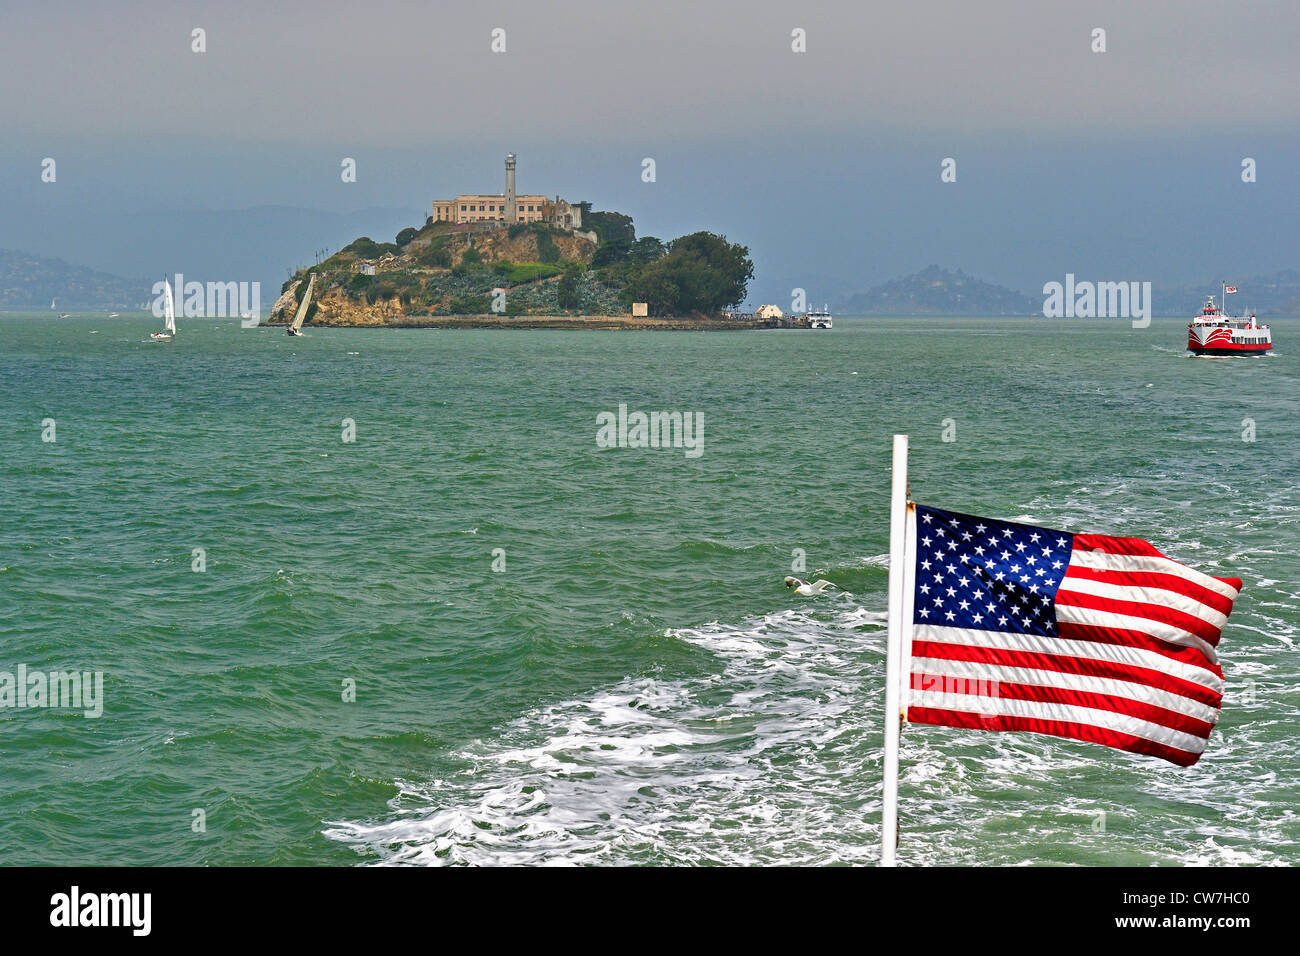 prison on Alcatraz Island and American Flag, USA, California, Alcatraz Island, San Francisco - Stock Image